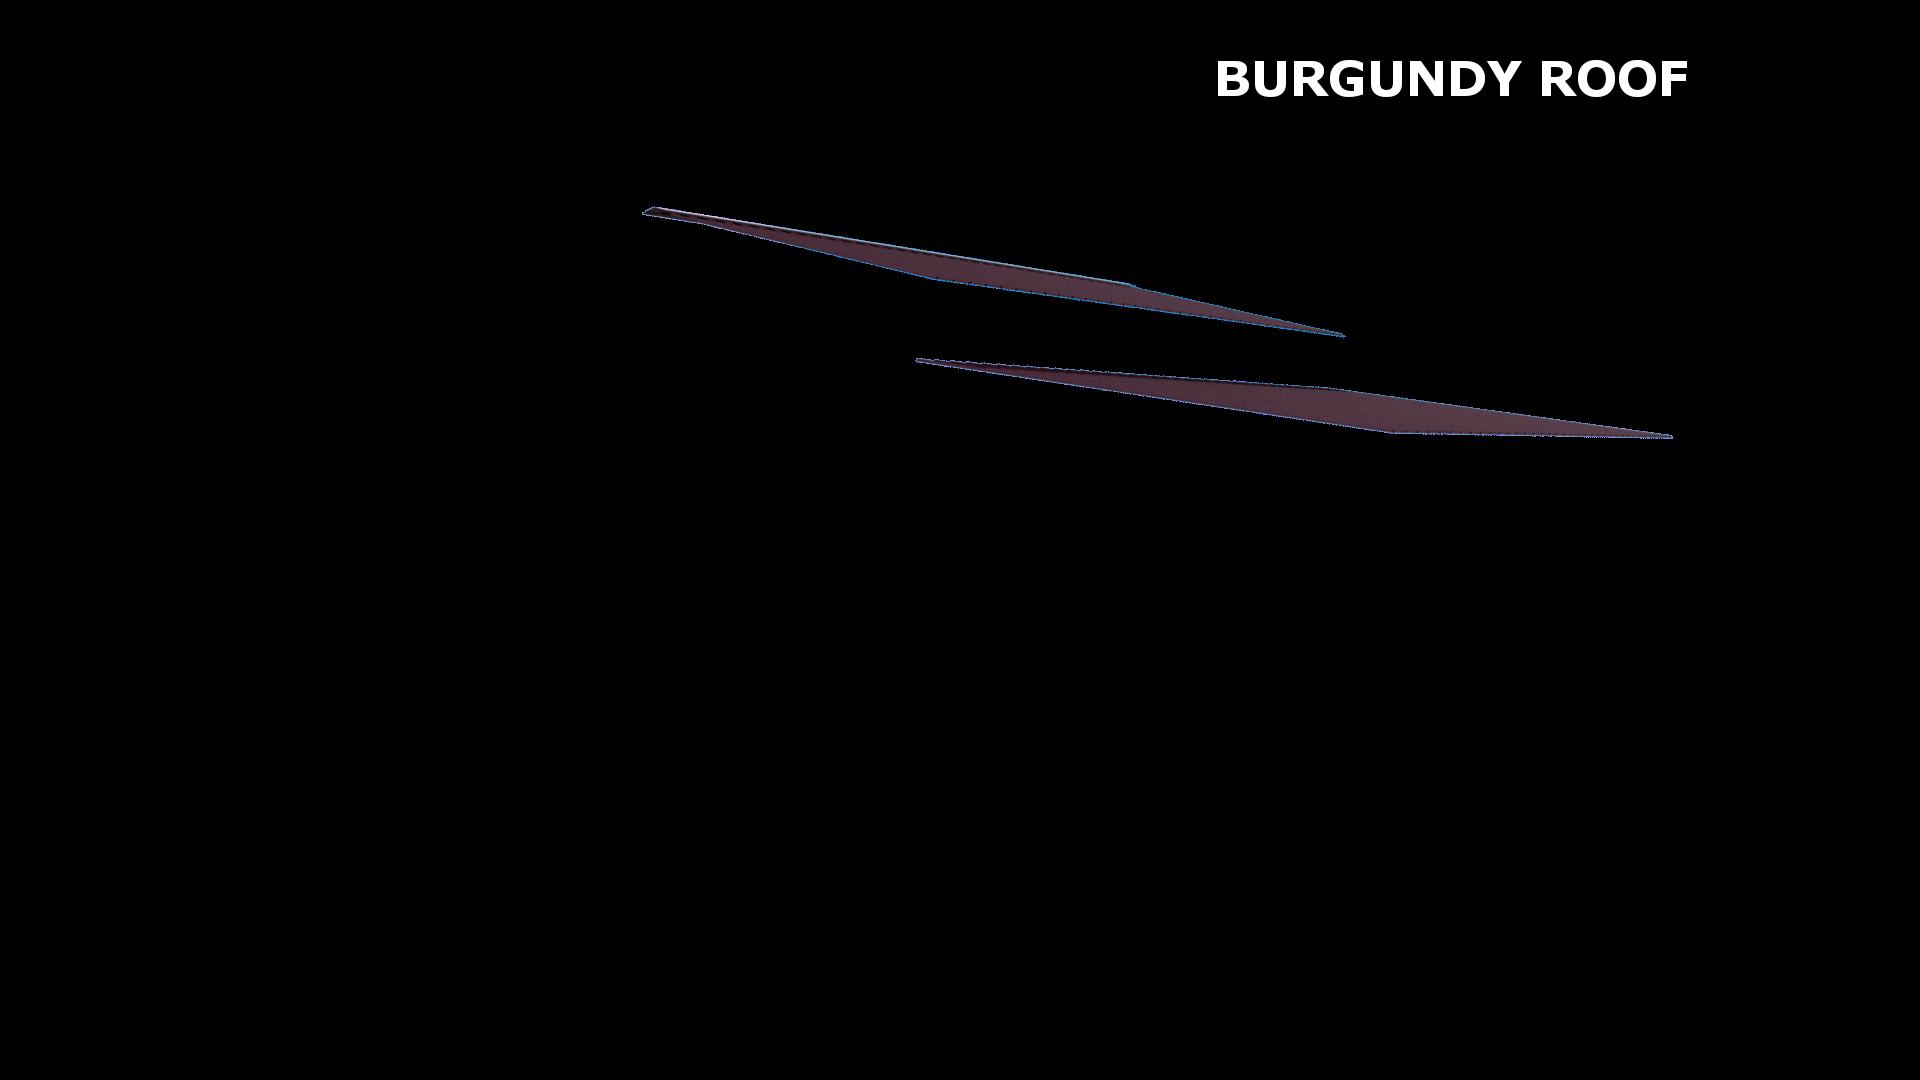 BURGUNDY ROOF